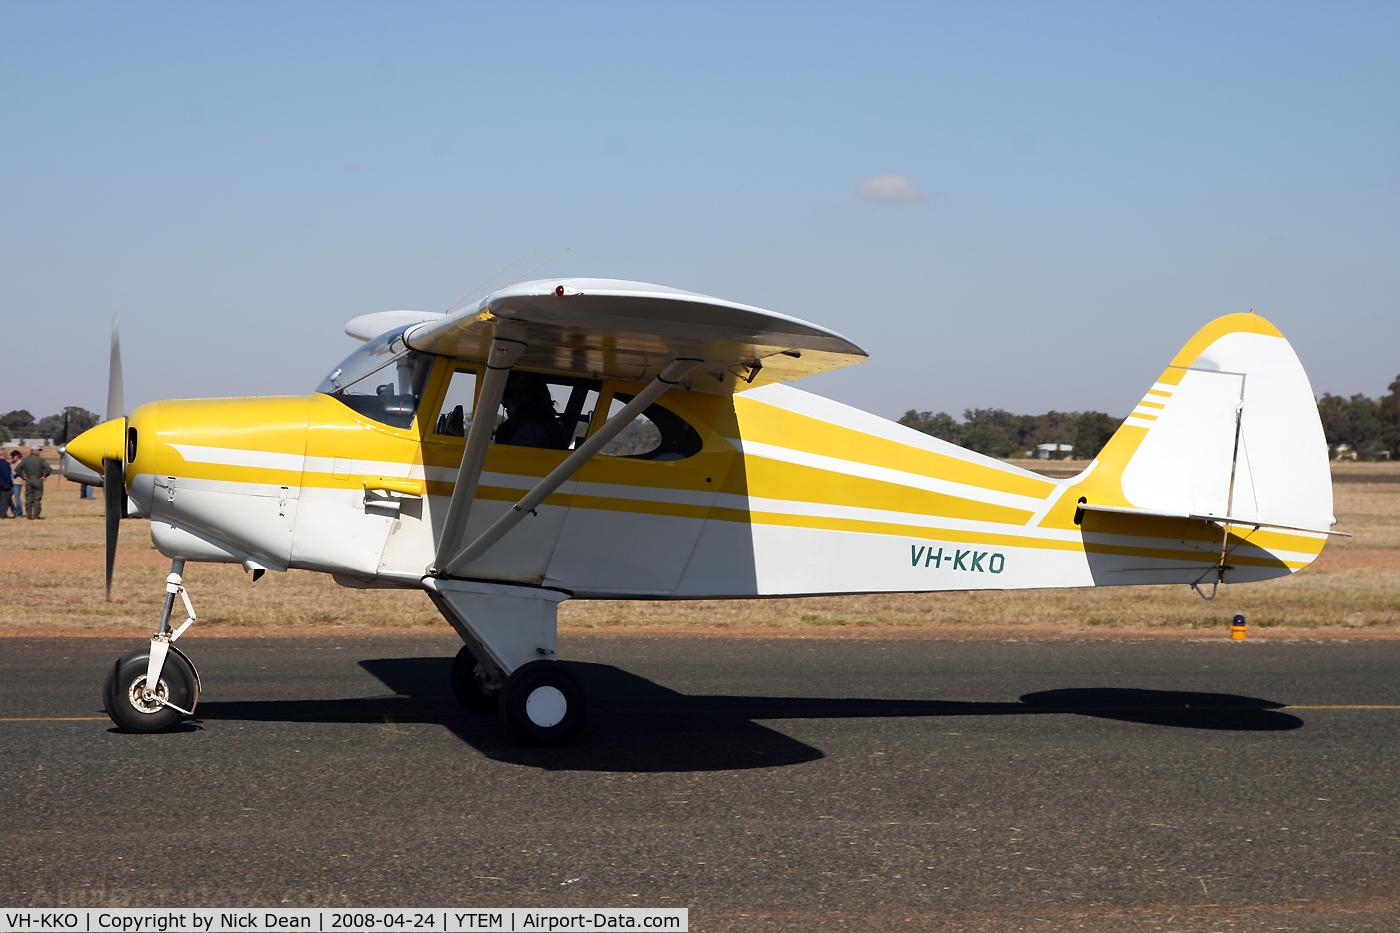 VH-KKO, 1952 Piper PA-22-150 C/N 22-878, YTEM (AAAA annual fly-in)